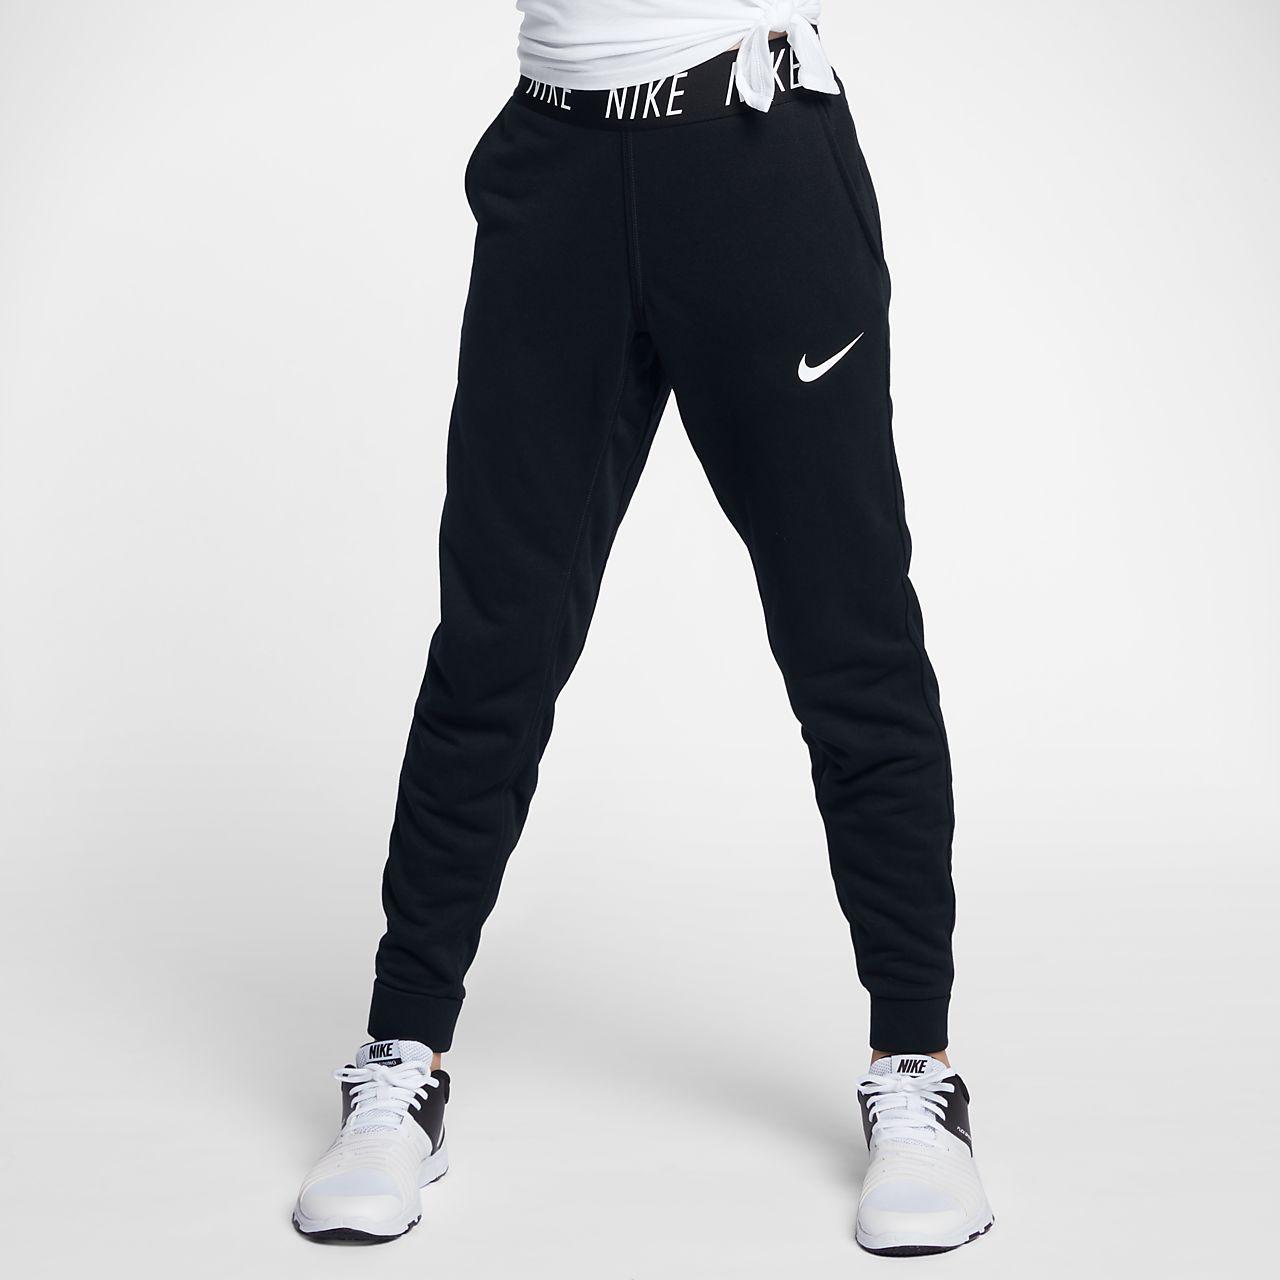 De Core Dry Pantalon Fille Plus Studio Nike Training Pour Âgée FSggqv